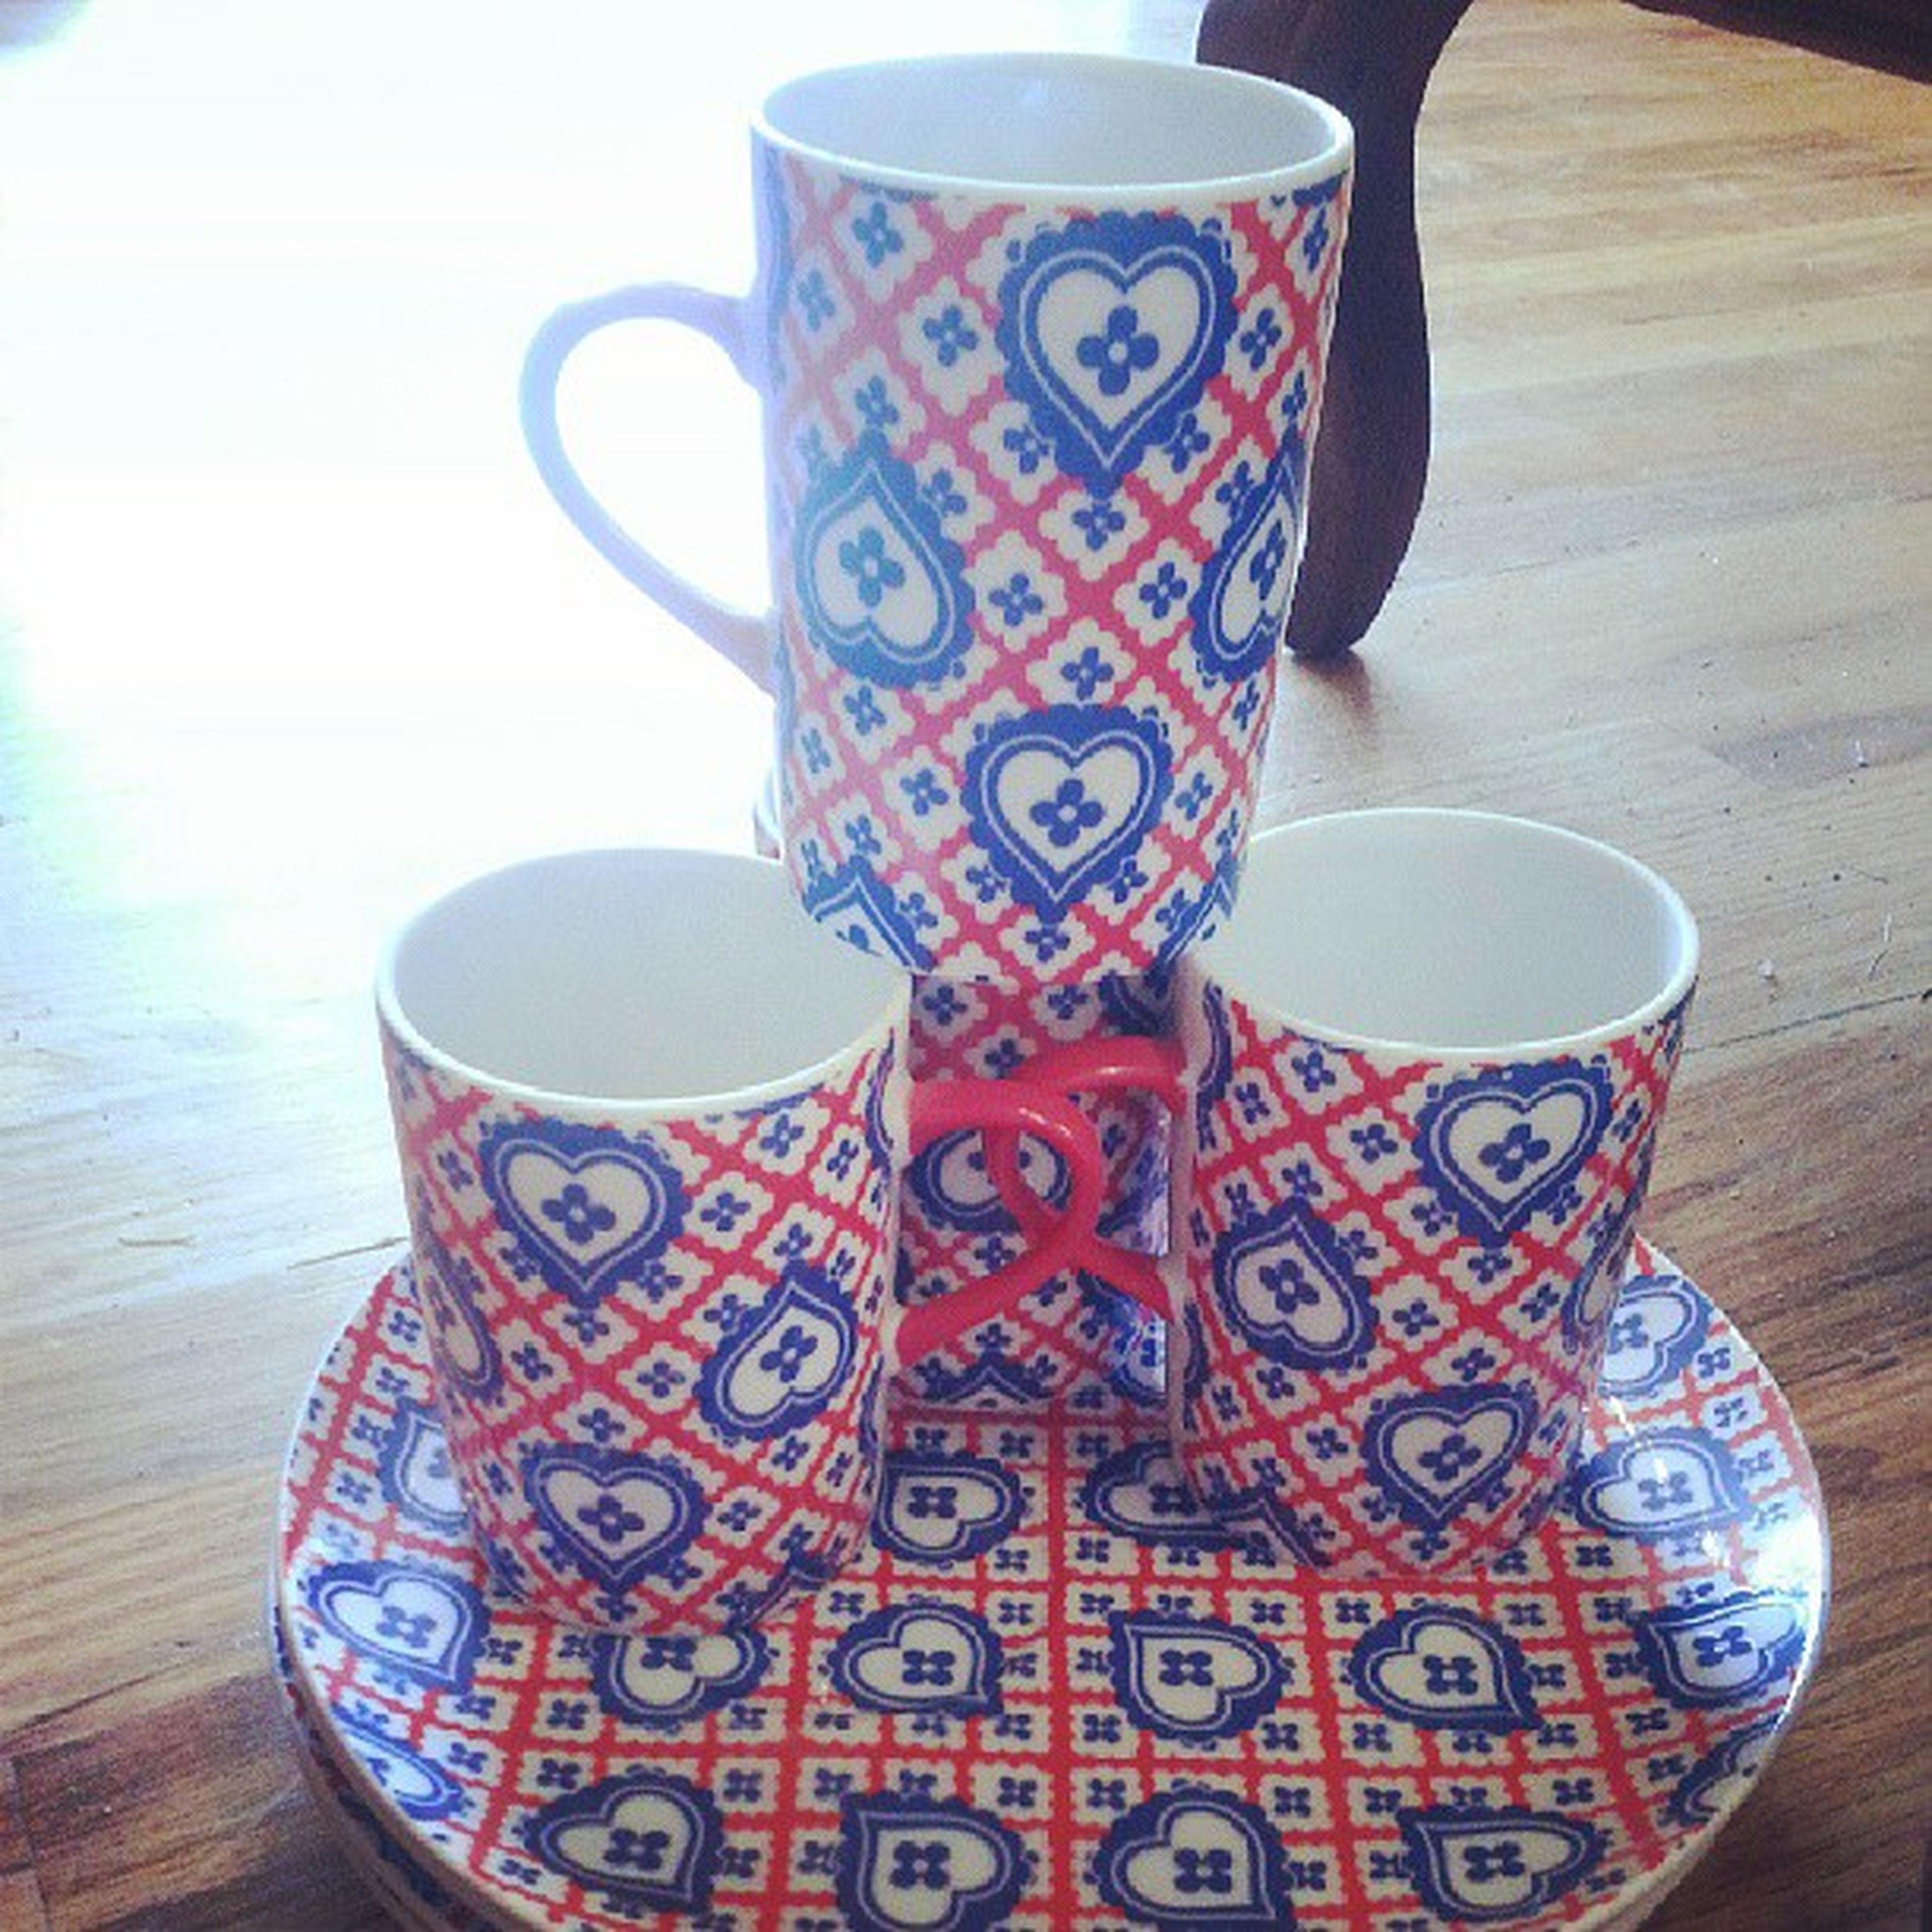 Four ceramic mugs and plates. Amazing Design Hingestore Cincinnati Ofcoursewedoshipping